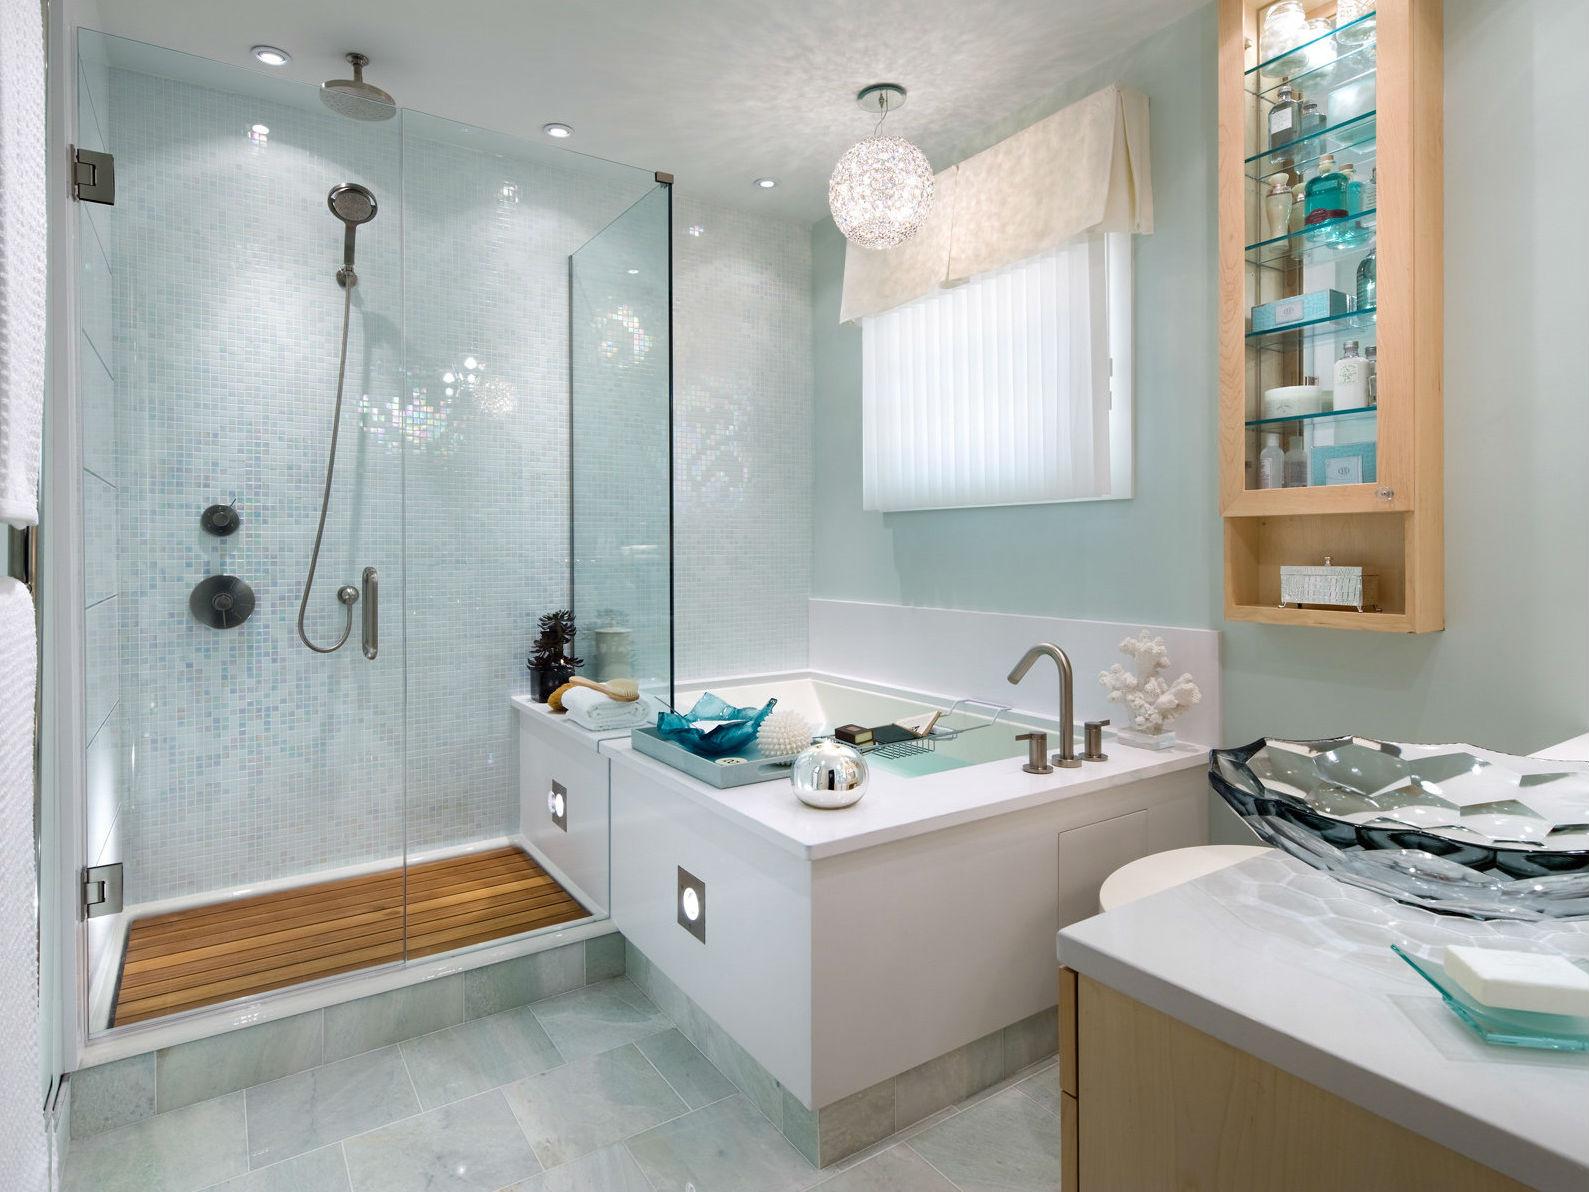 каталог плитки ванных комнат